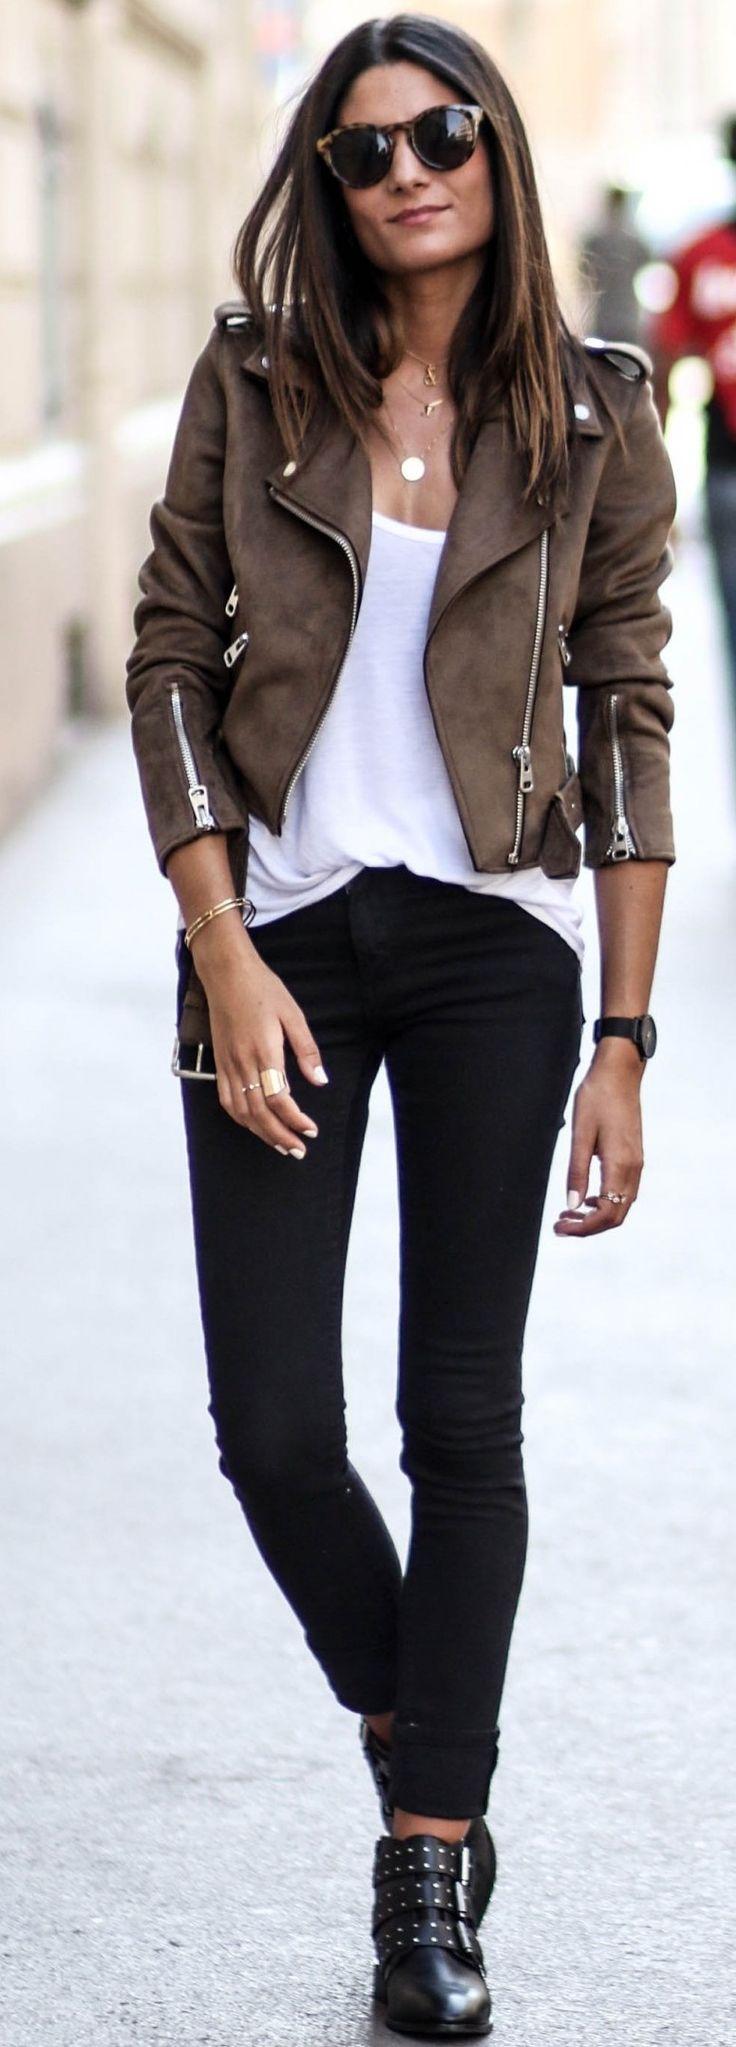 25  best ideas about Black jeans on Pinterest | Black pants outfit ...